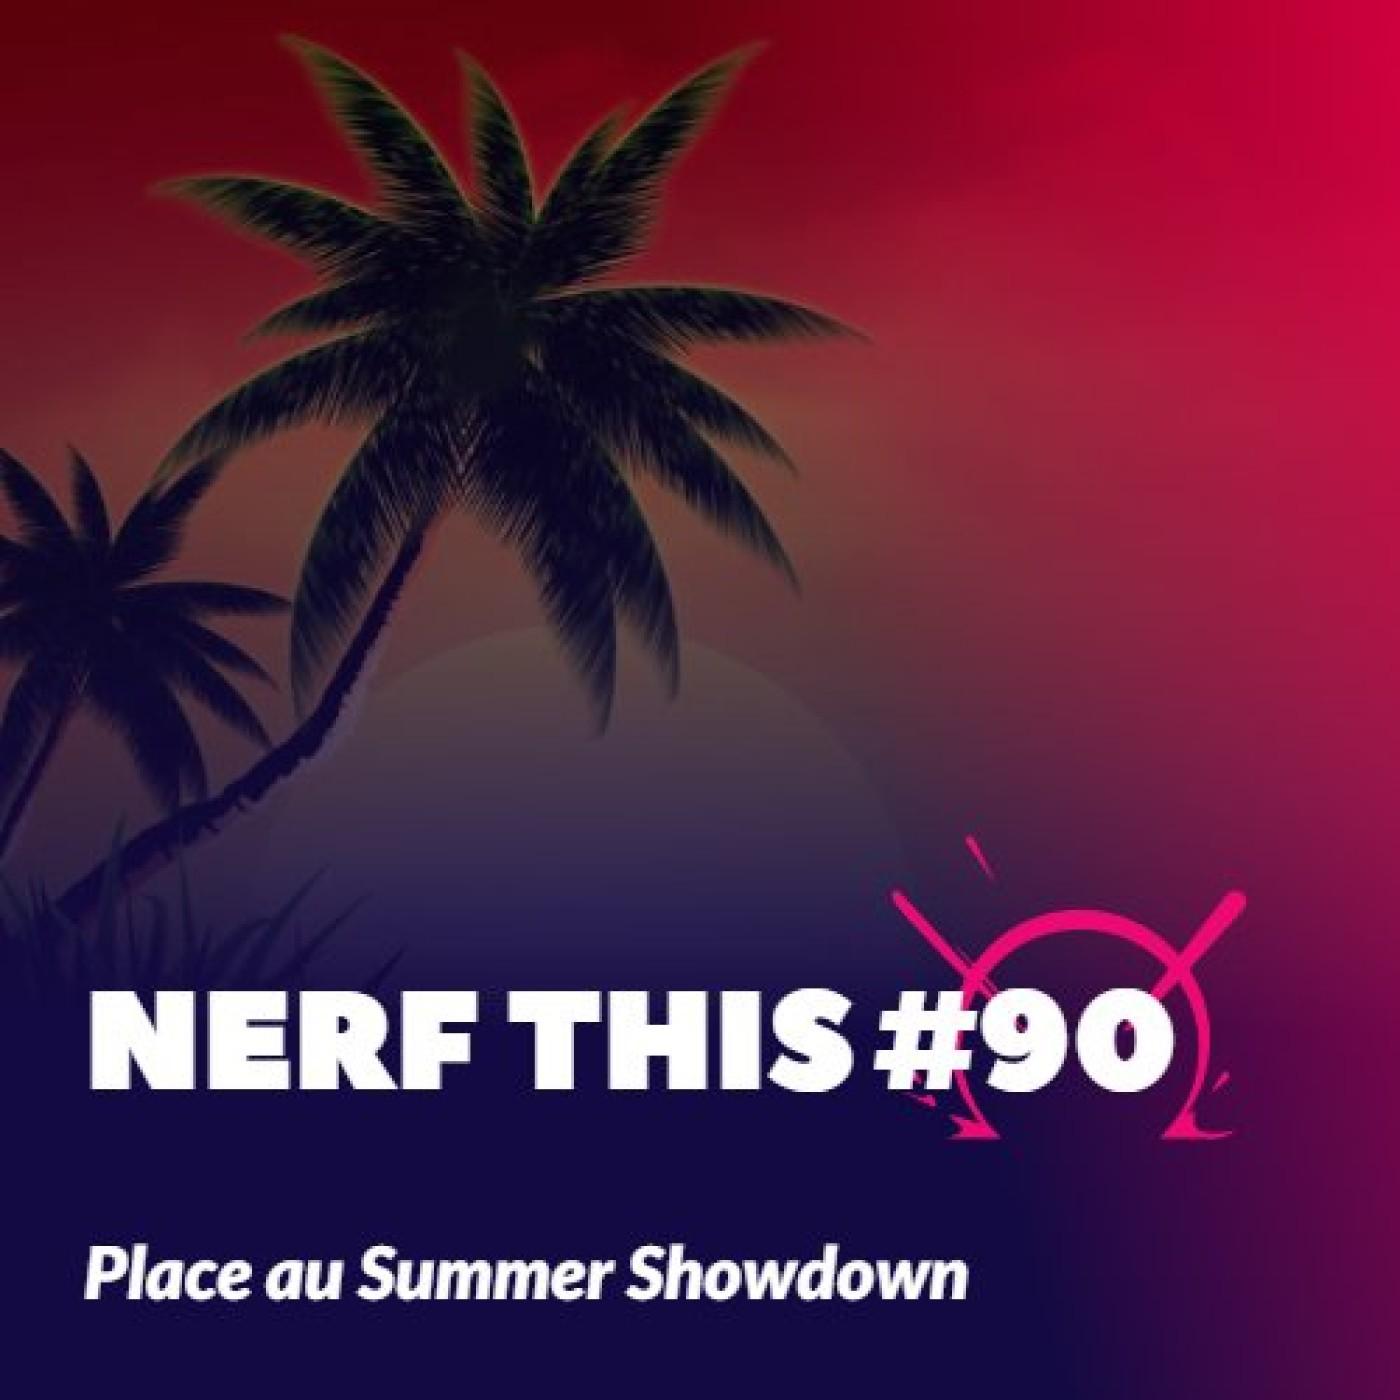 Nerf This - Place au Summer Showdown